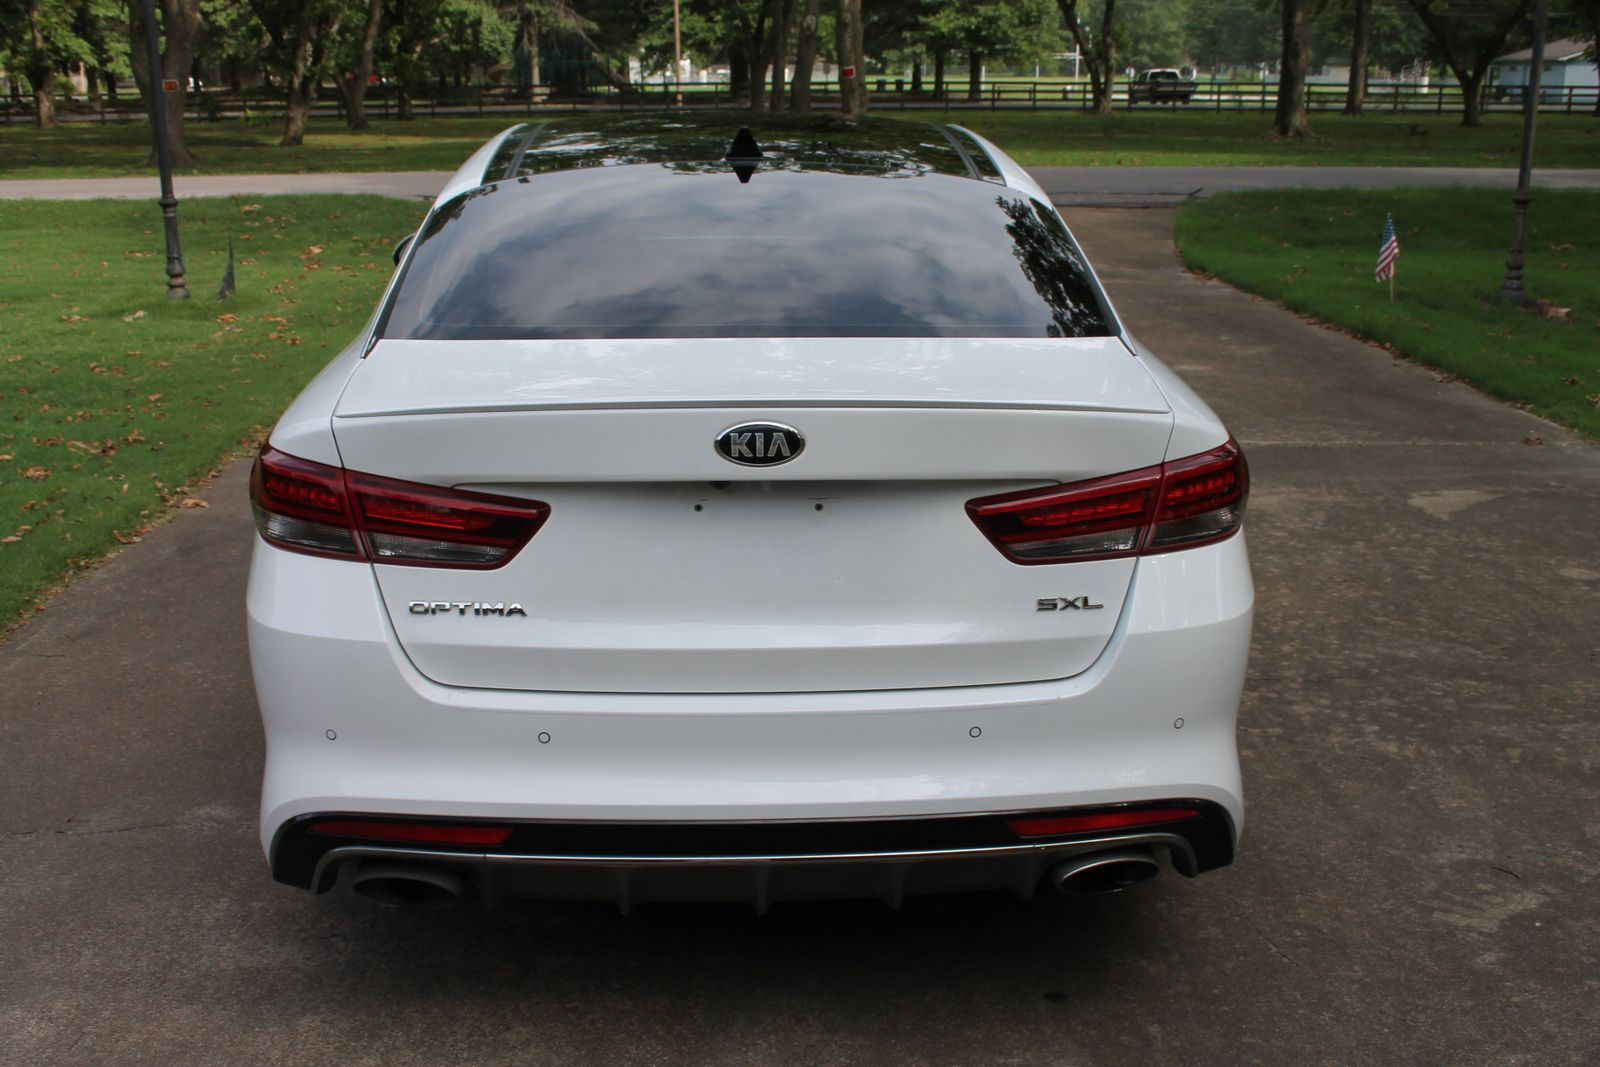 2016 Kia Optima Sxl Turbo Price Used Cars Memphis Hallum Motors Rear View Camera Citystatezip In Marion